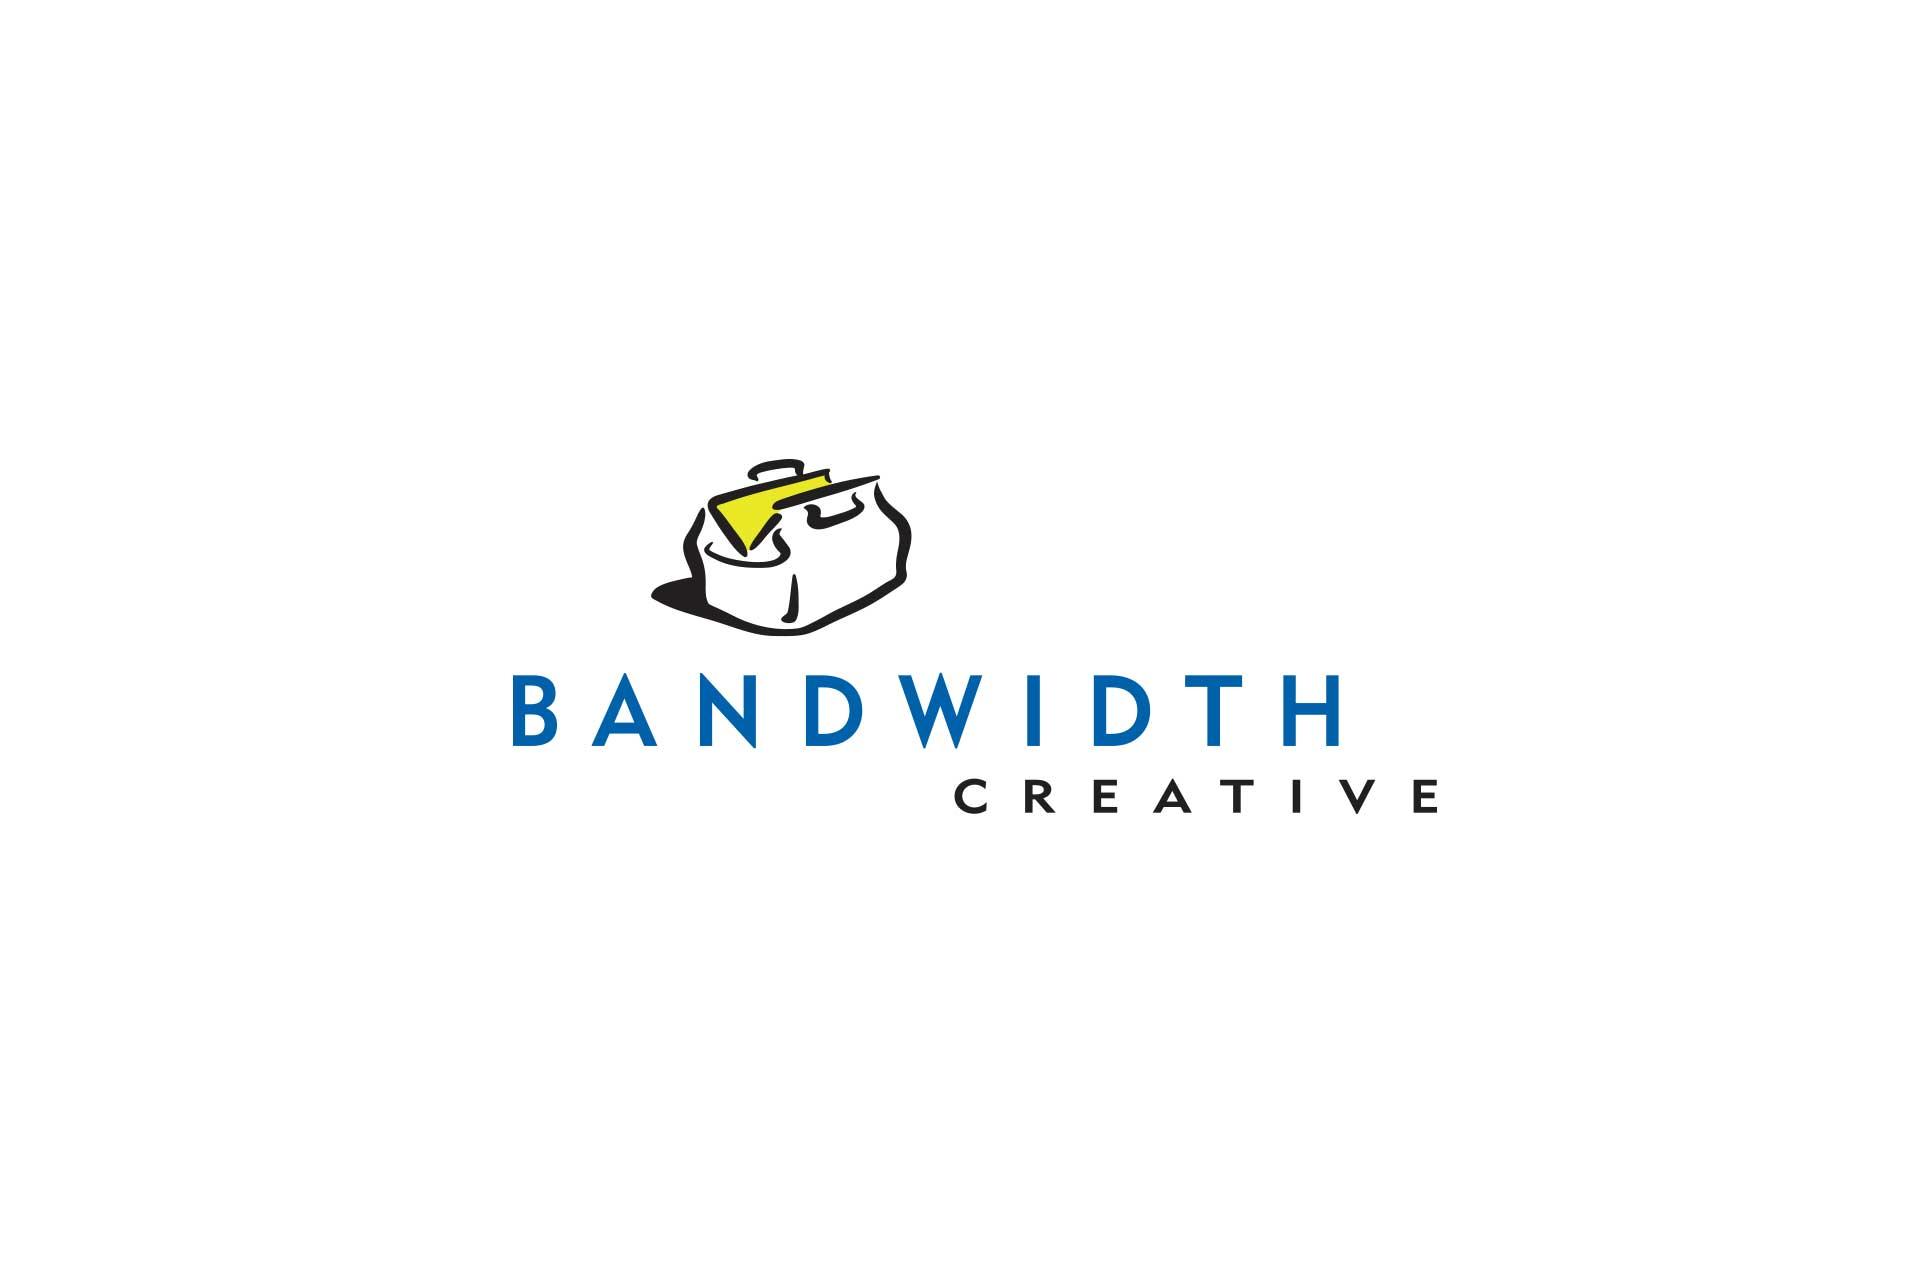 Bandwidth Creative